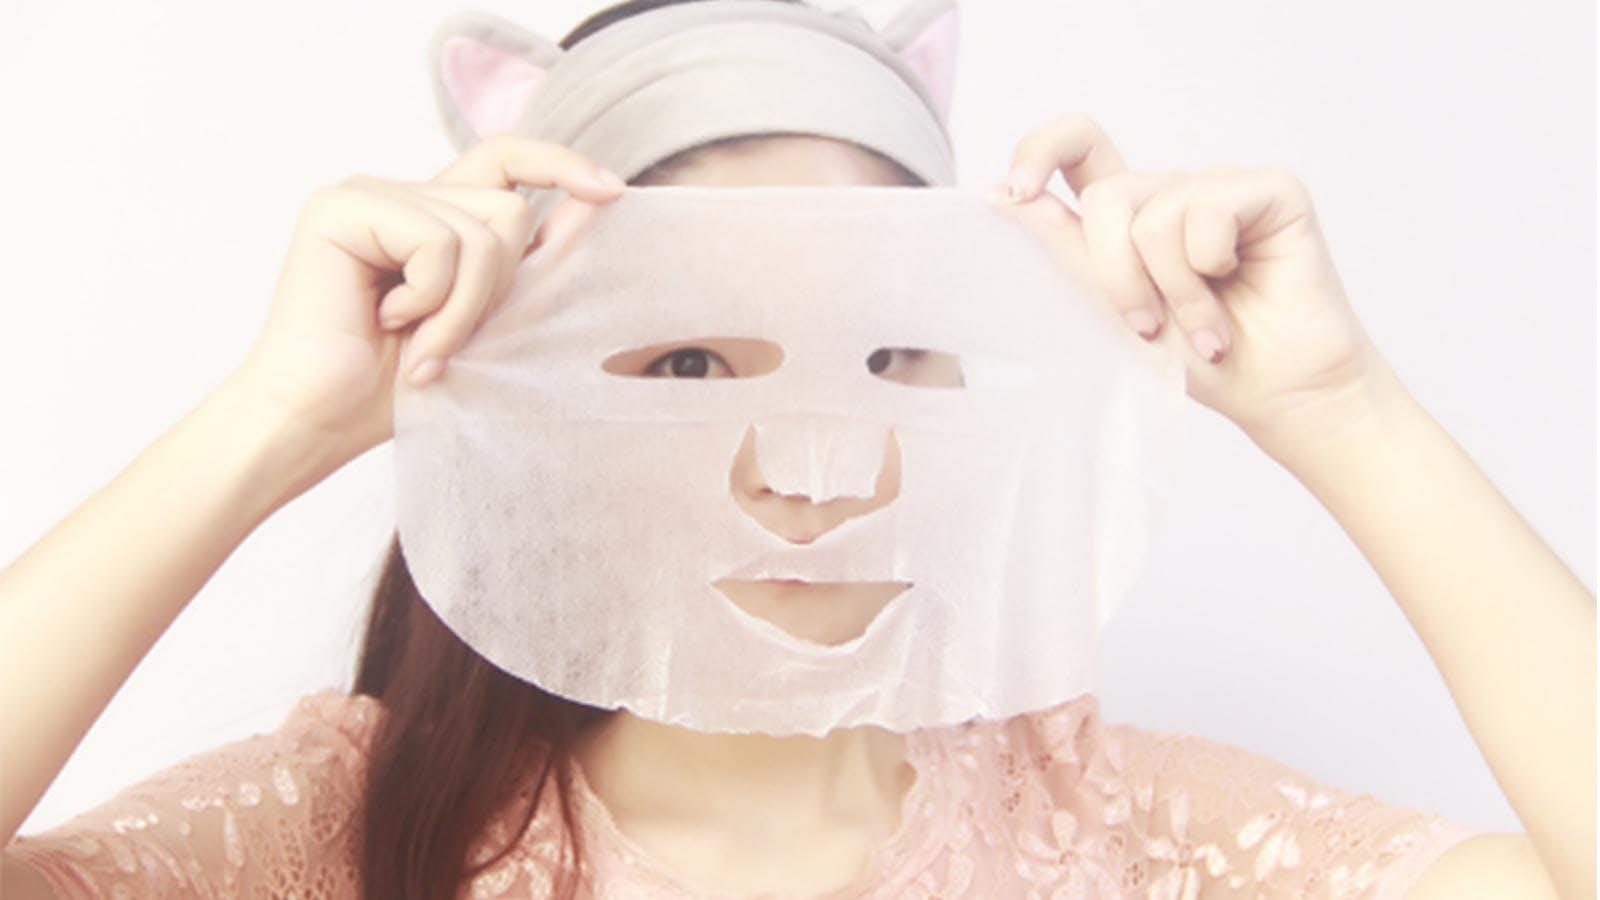 bio-cellulose sheet mask